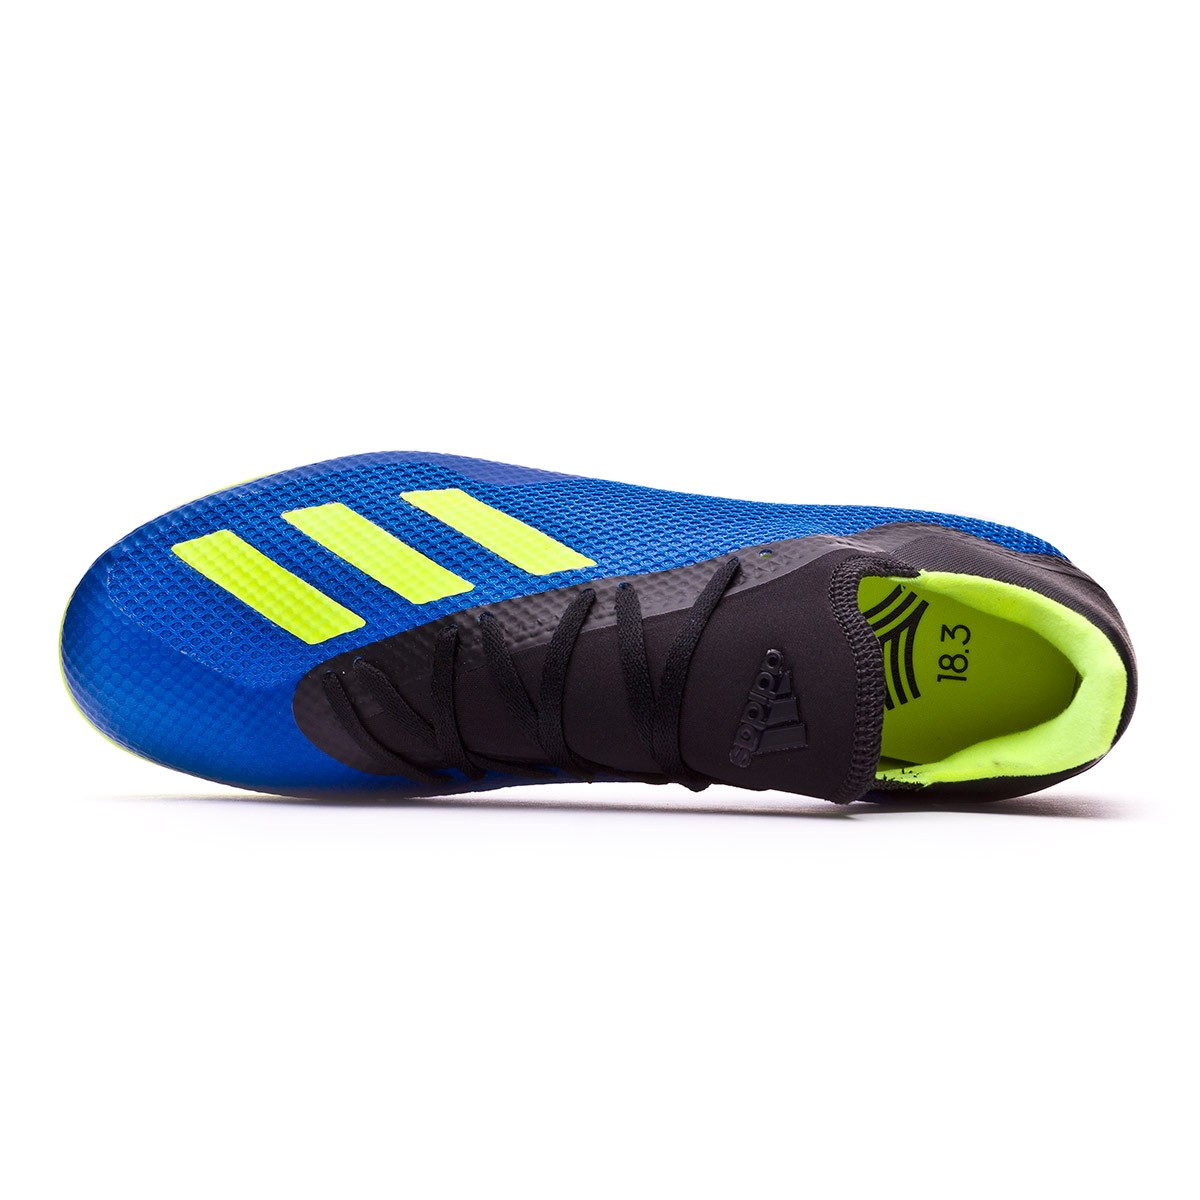 Futsal Boot adidas X Tango IN Foot Bleu Solar Jaune Noir